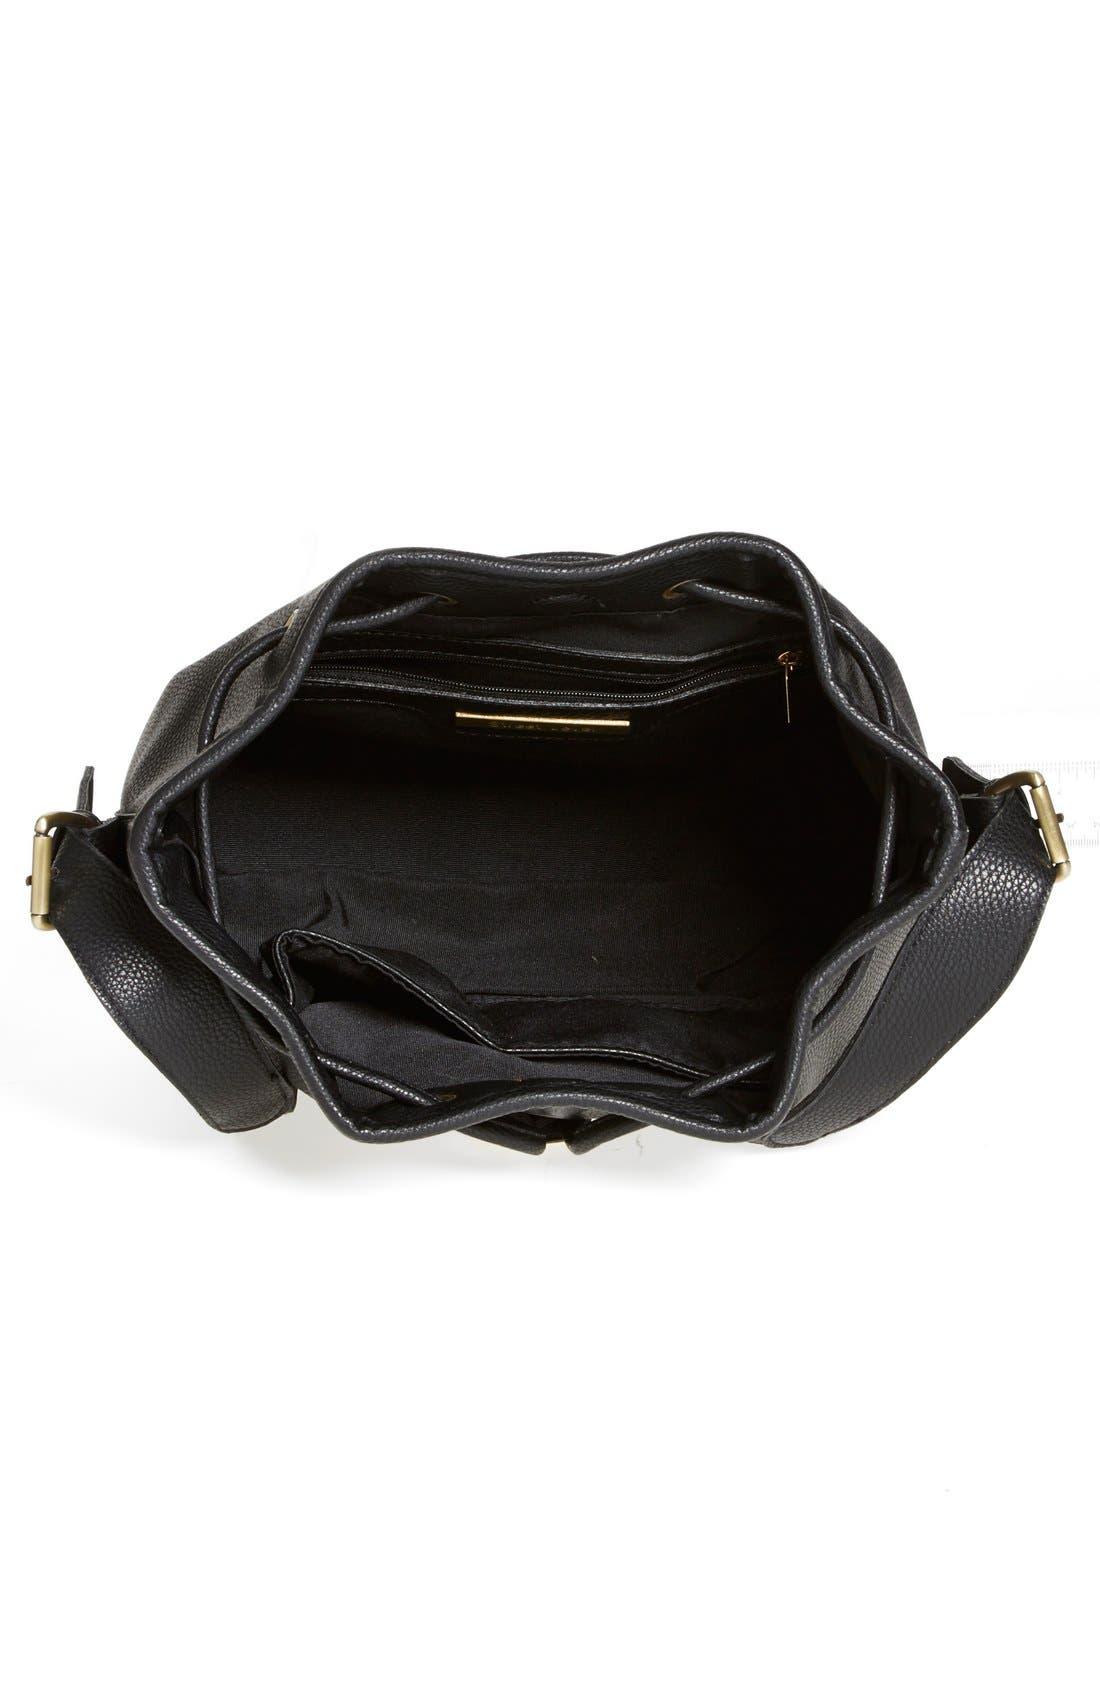 STREET LEVEL, 'Concha' Faux Leather Bucket Bag, Alternate thumbnail 3, color, 001